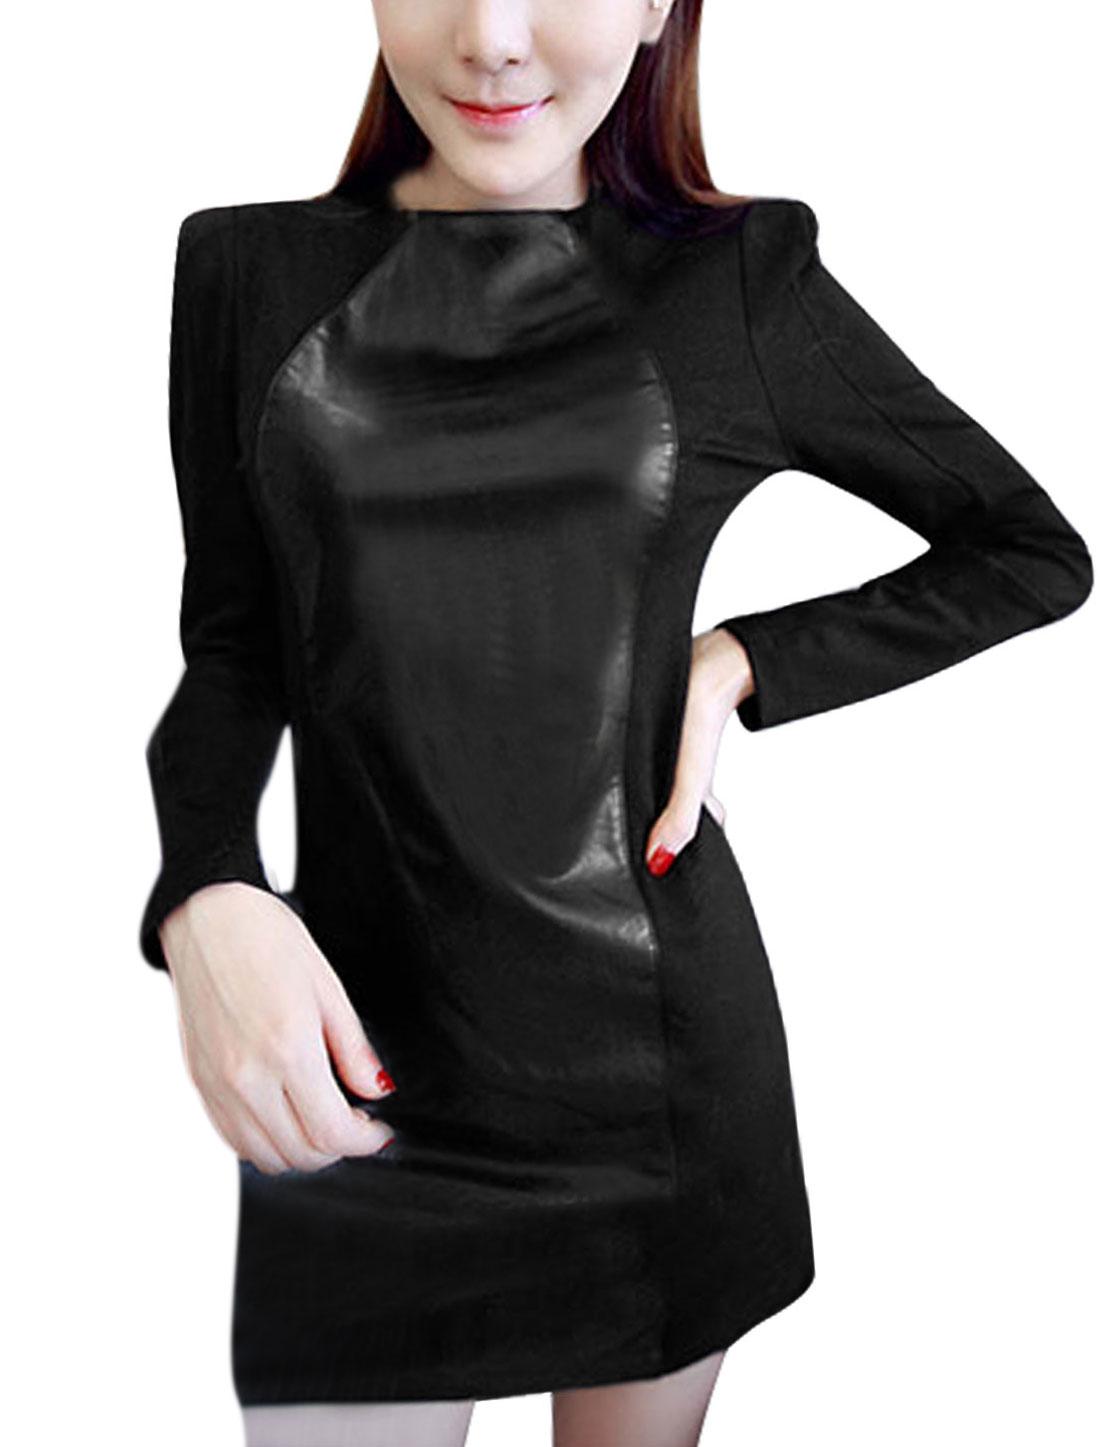 Ladies Imitation Leather Panel Long Sleeves Black Sheath Dress XS